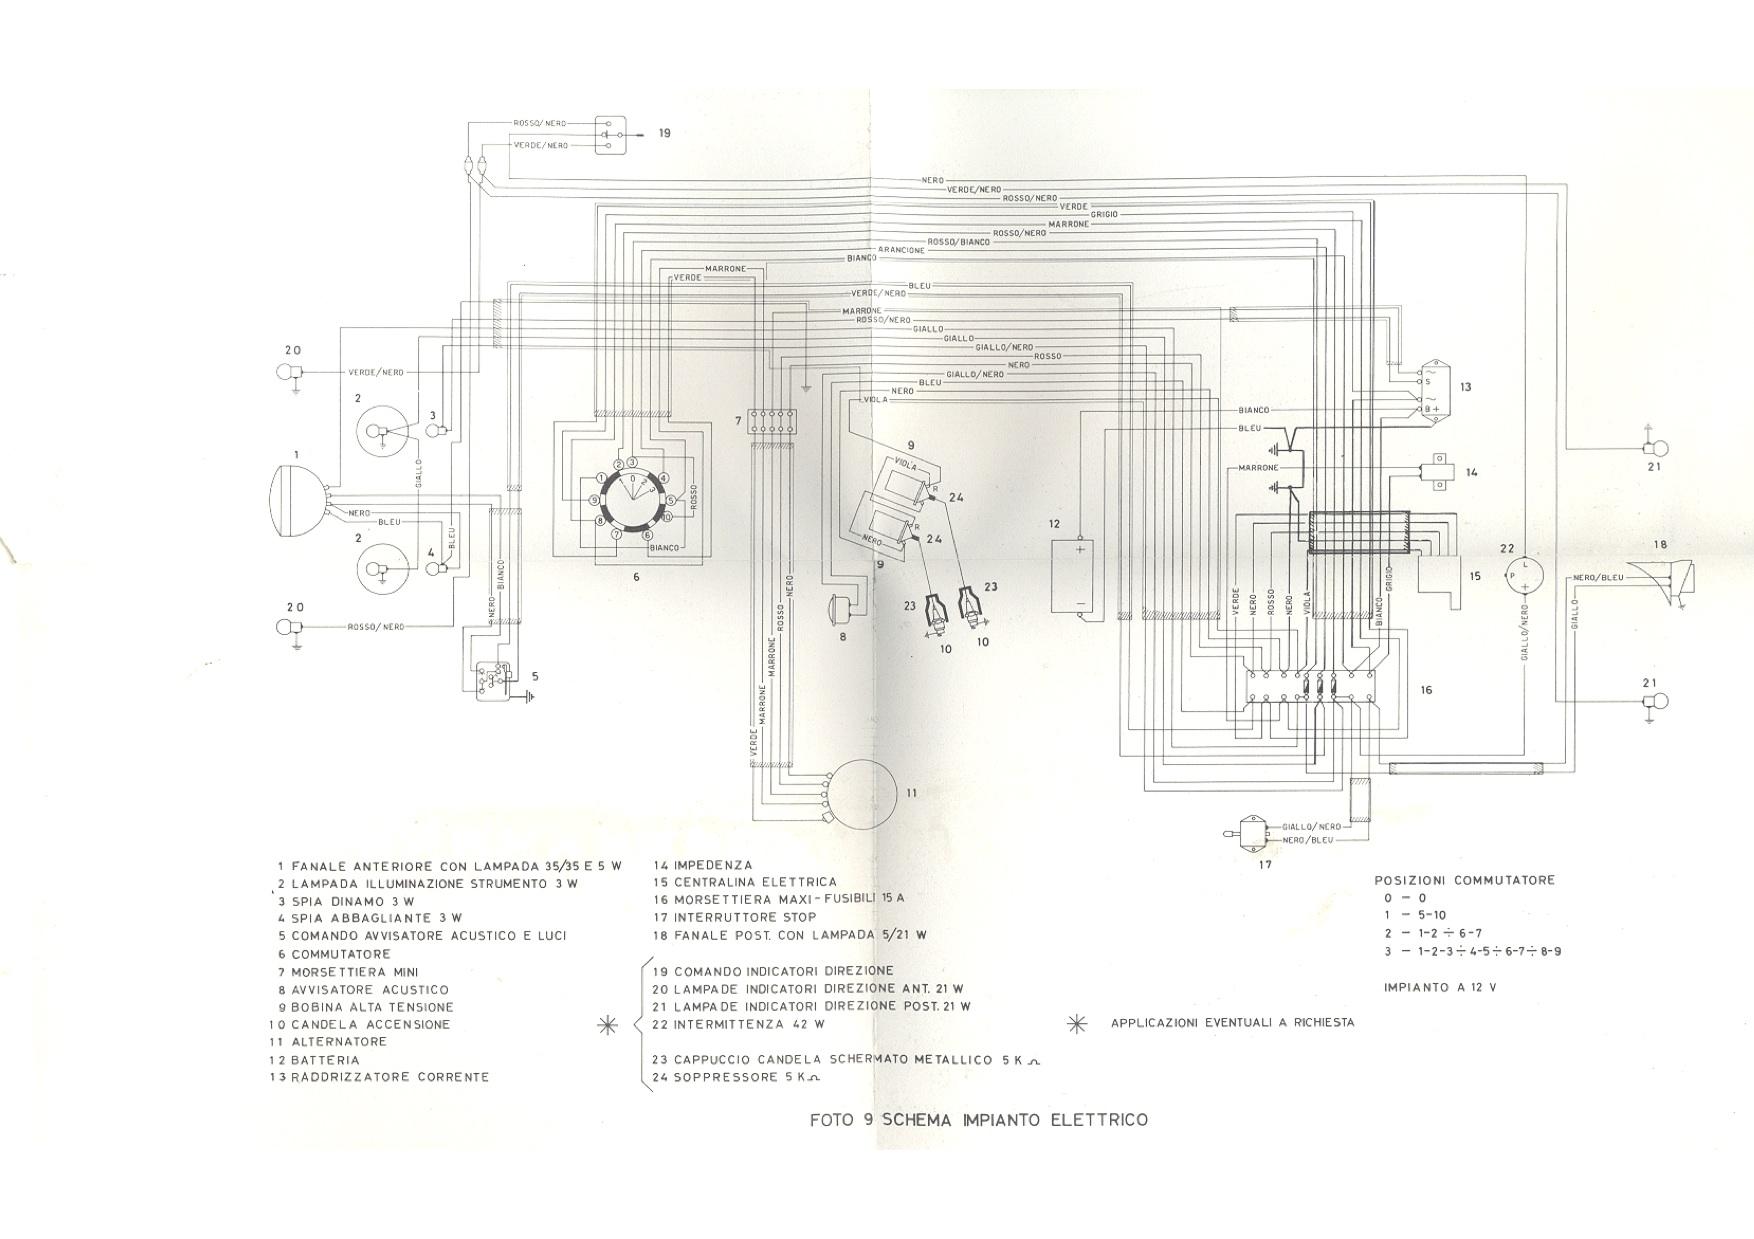 lambretta ld 150 wiring diagram wiring diagram ignition evergreen variotronic lambretta ld d 150 scooter lambretta wiring diagrams electrical source